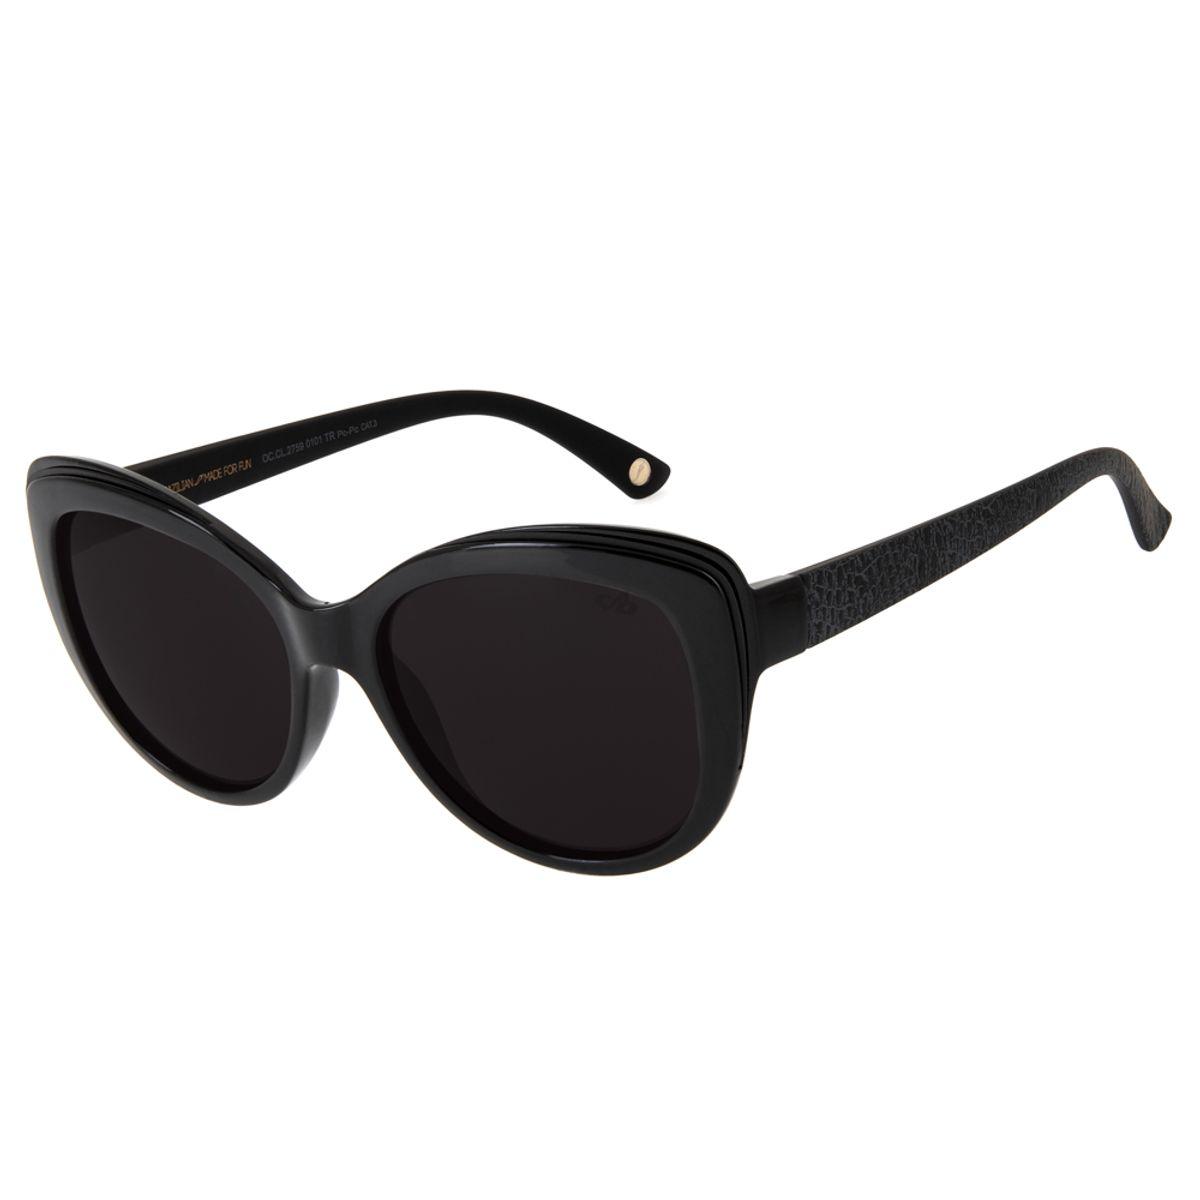 f02a50276 Óculos de Sol Redondo Feminino Chilli Beans Blk Beginning Preto 2759 ...